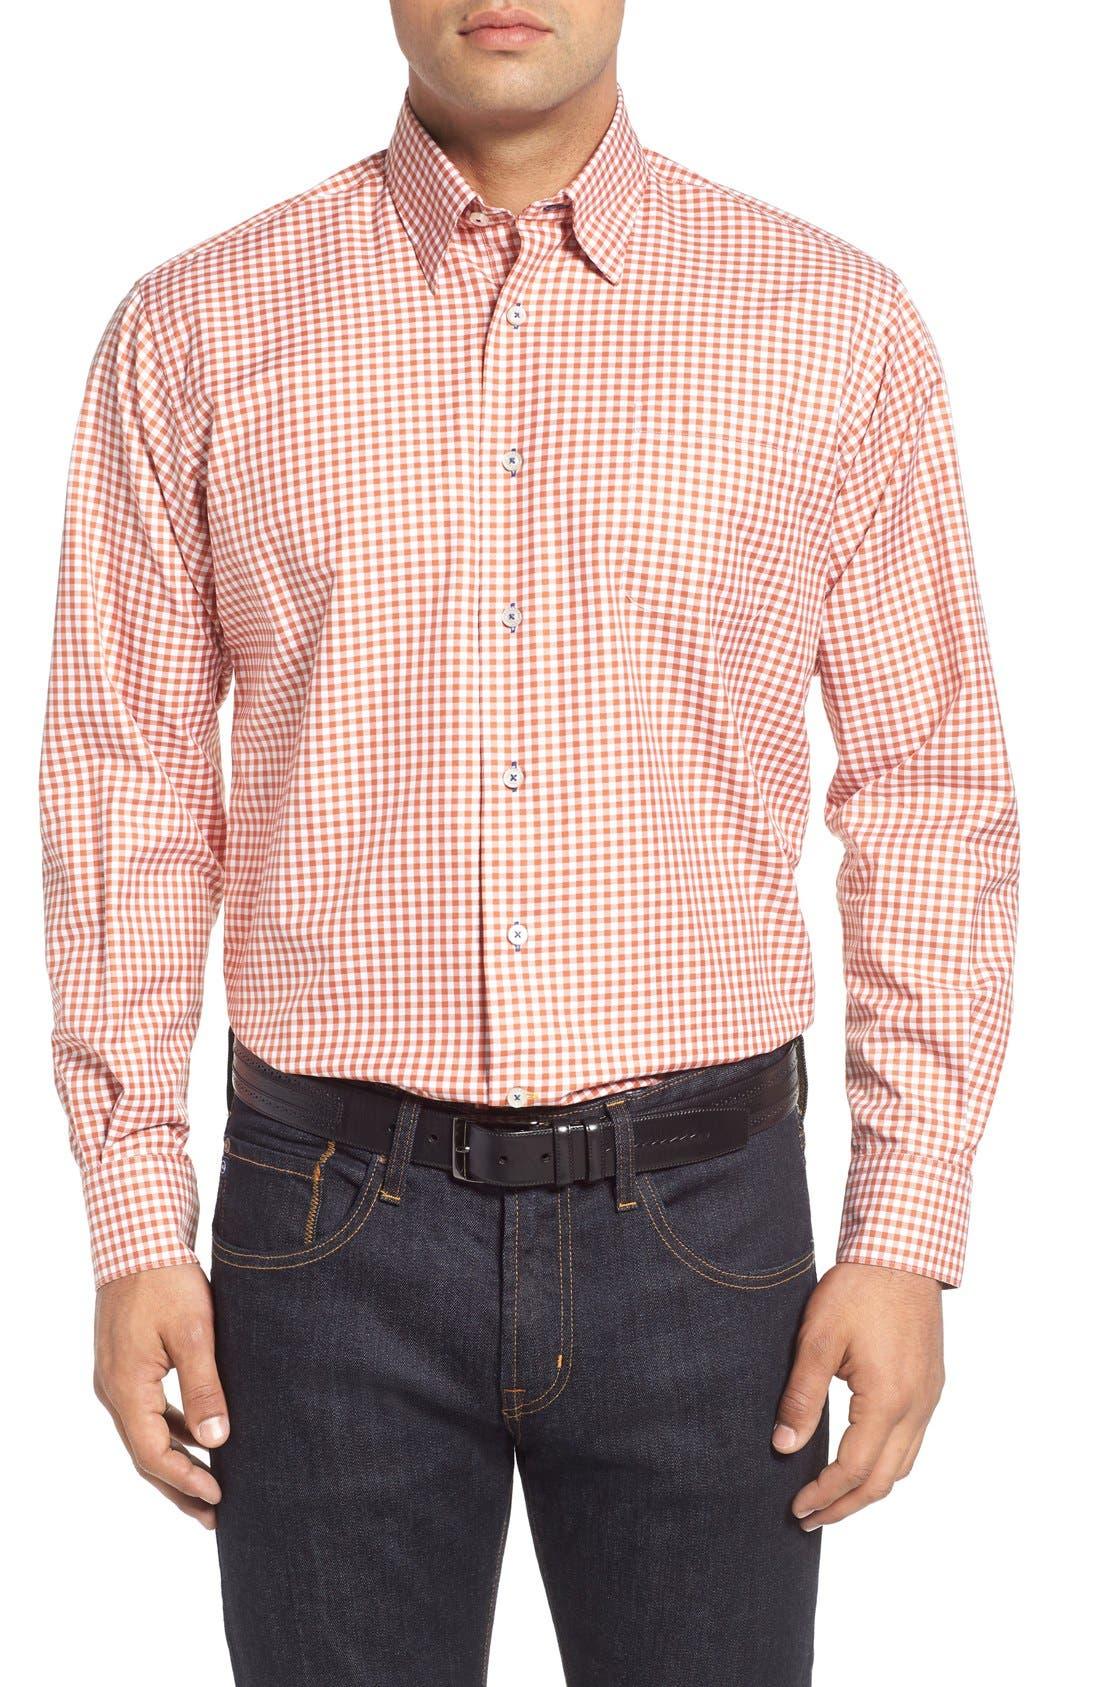 ROBERT TALBOTT 'Anderson' Classic Fit Gingham Sport Shirt